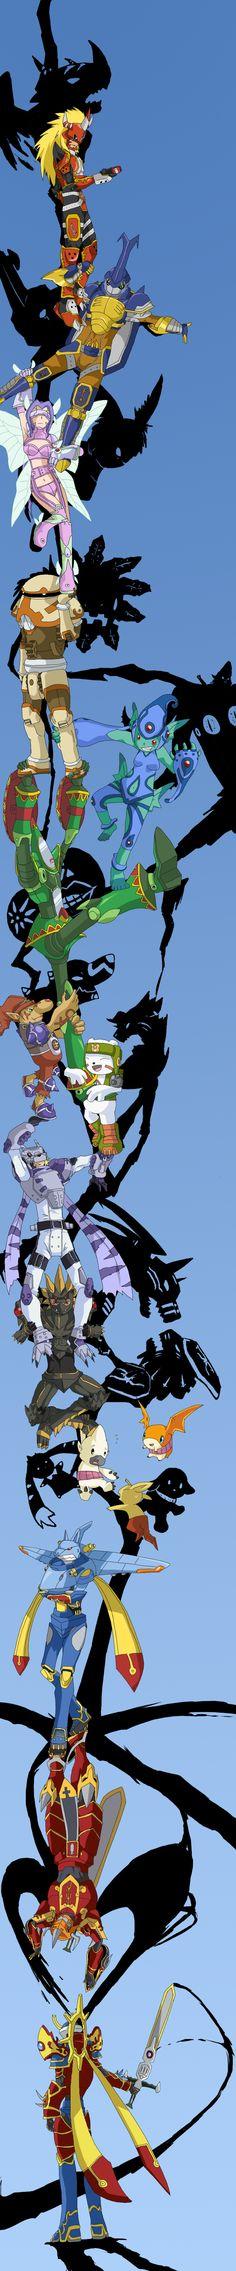 Digimon Frontier x Durarara by Garmmon.deviantart.com on @DeviantArt